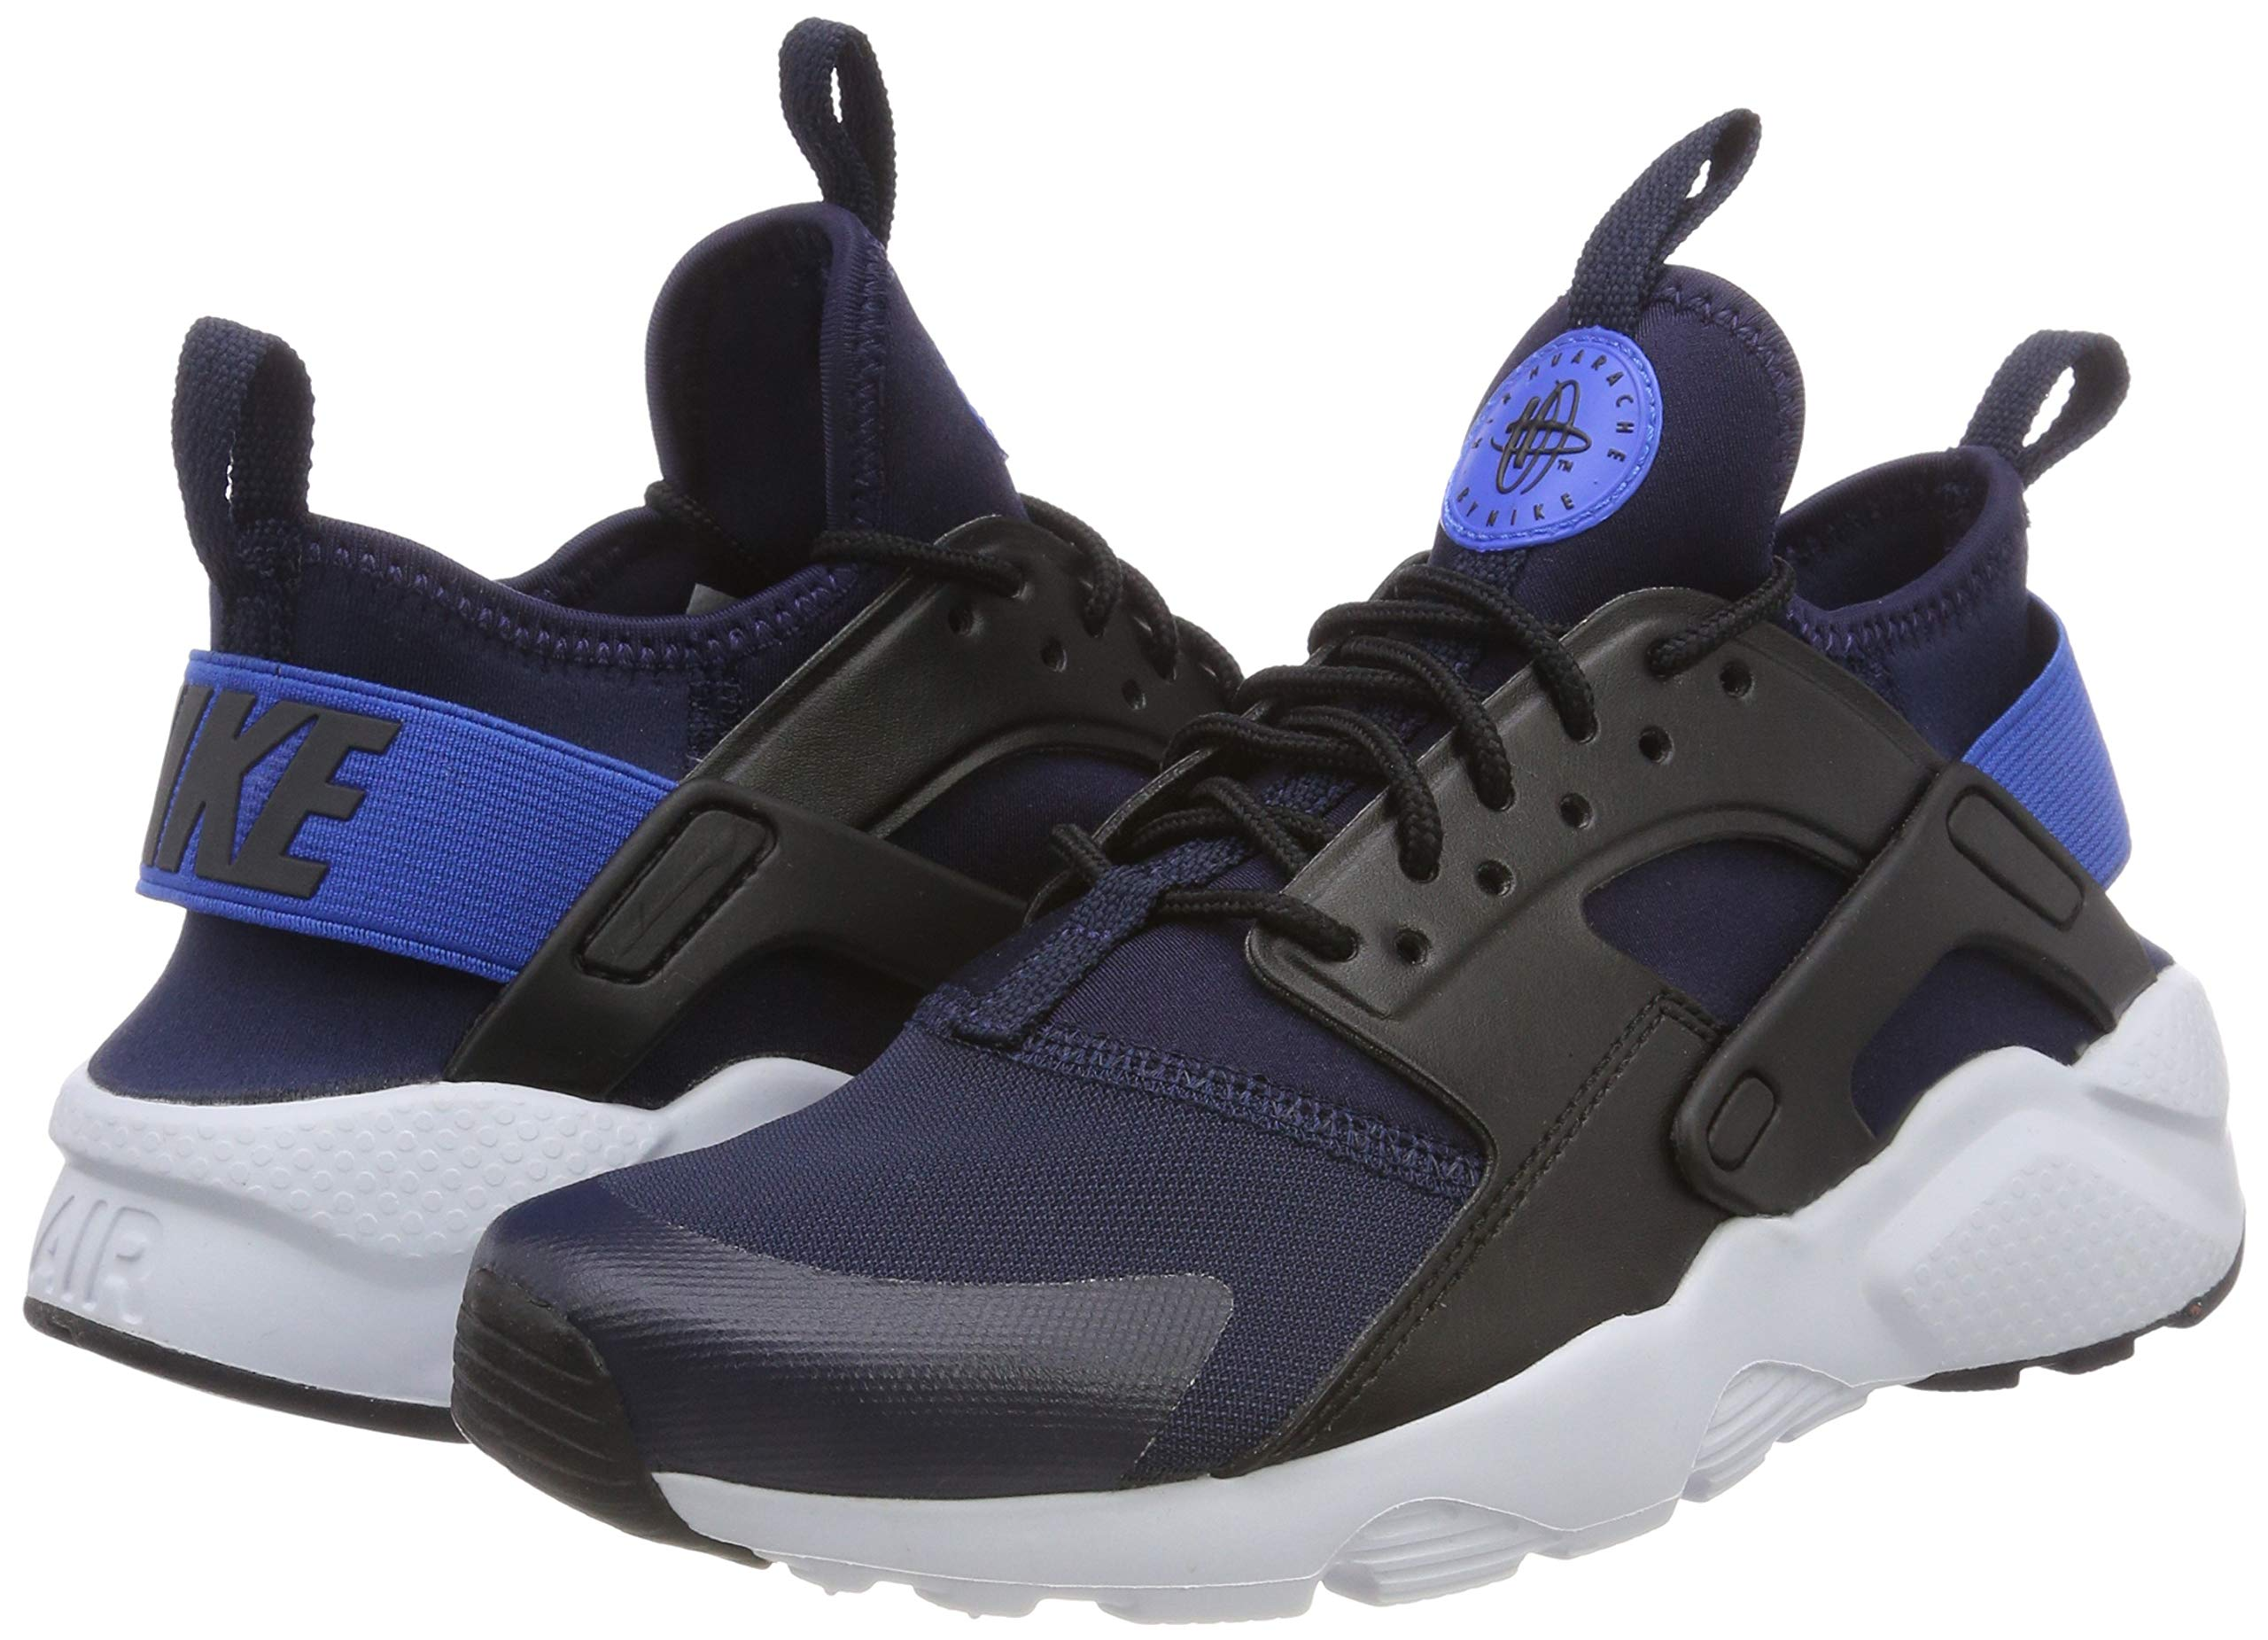 online retailer f8b79 27841 Nike Air Huarache Run Ultra GS, Scarpe Running Bambino